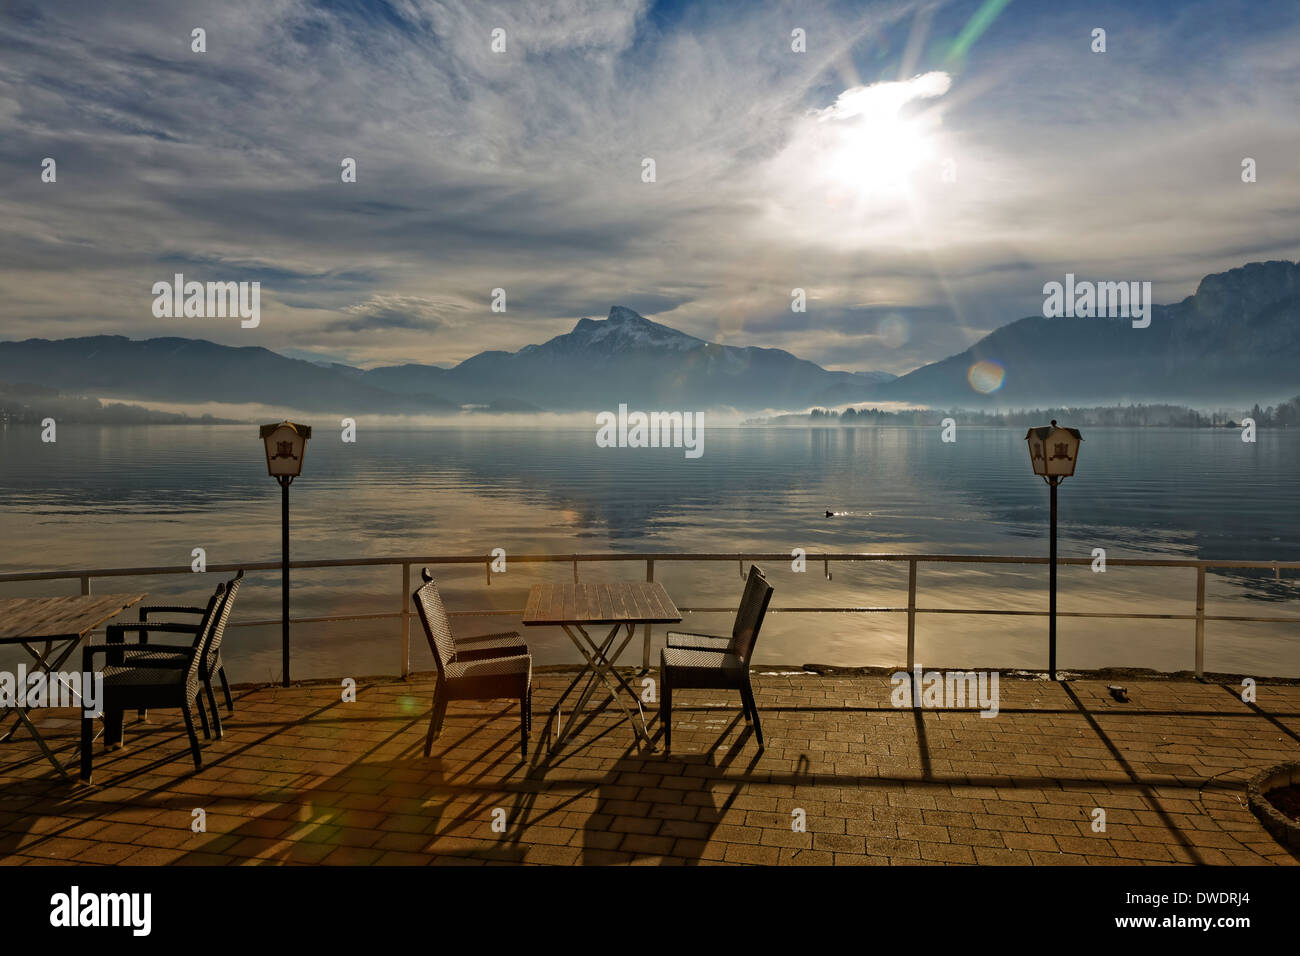 Austria, Upper Austria, Salzkammergut, Lake Mondsee at sunrise, in the background Mountain Schafberg Stock Photo